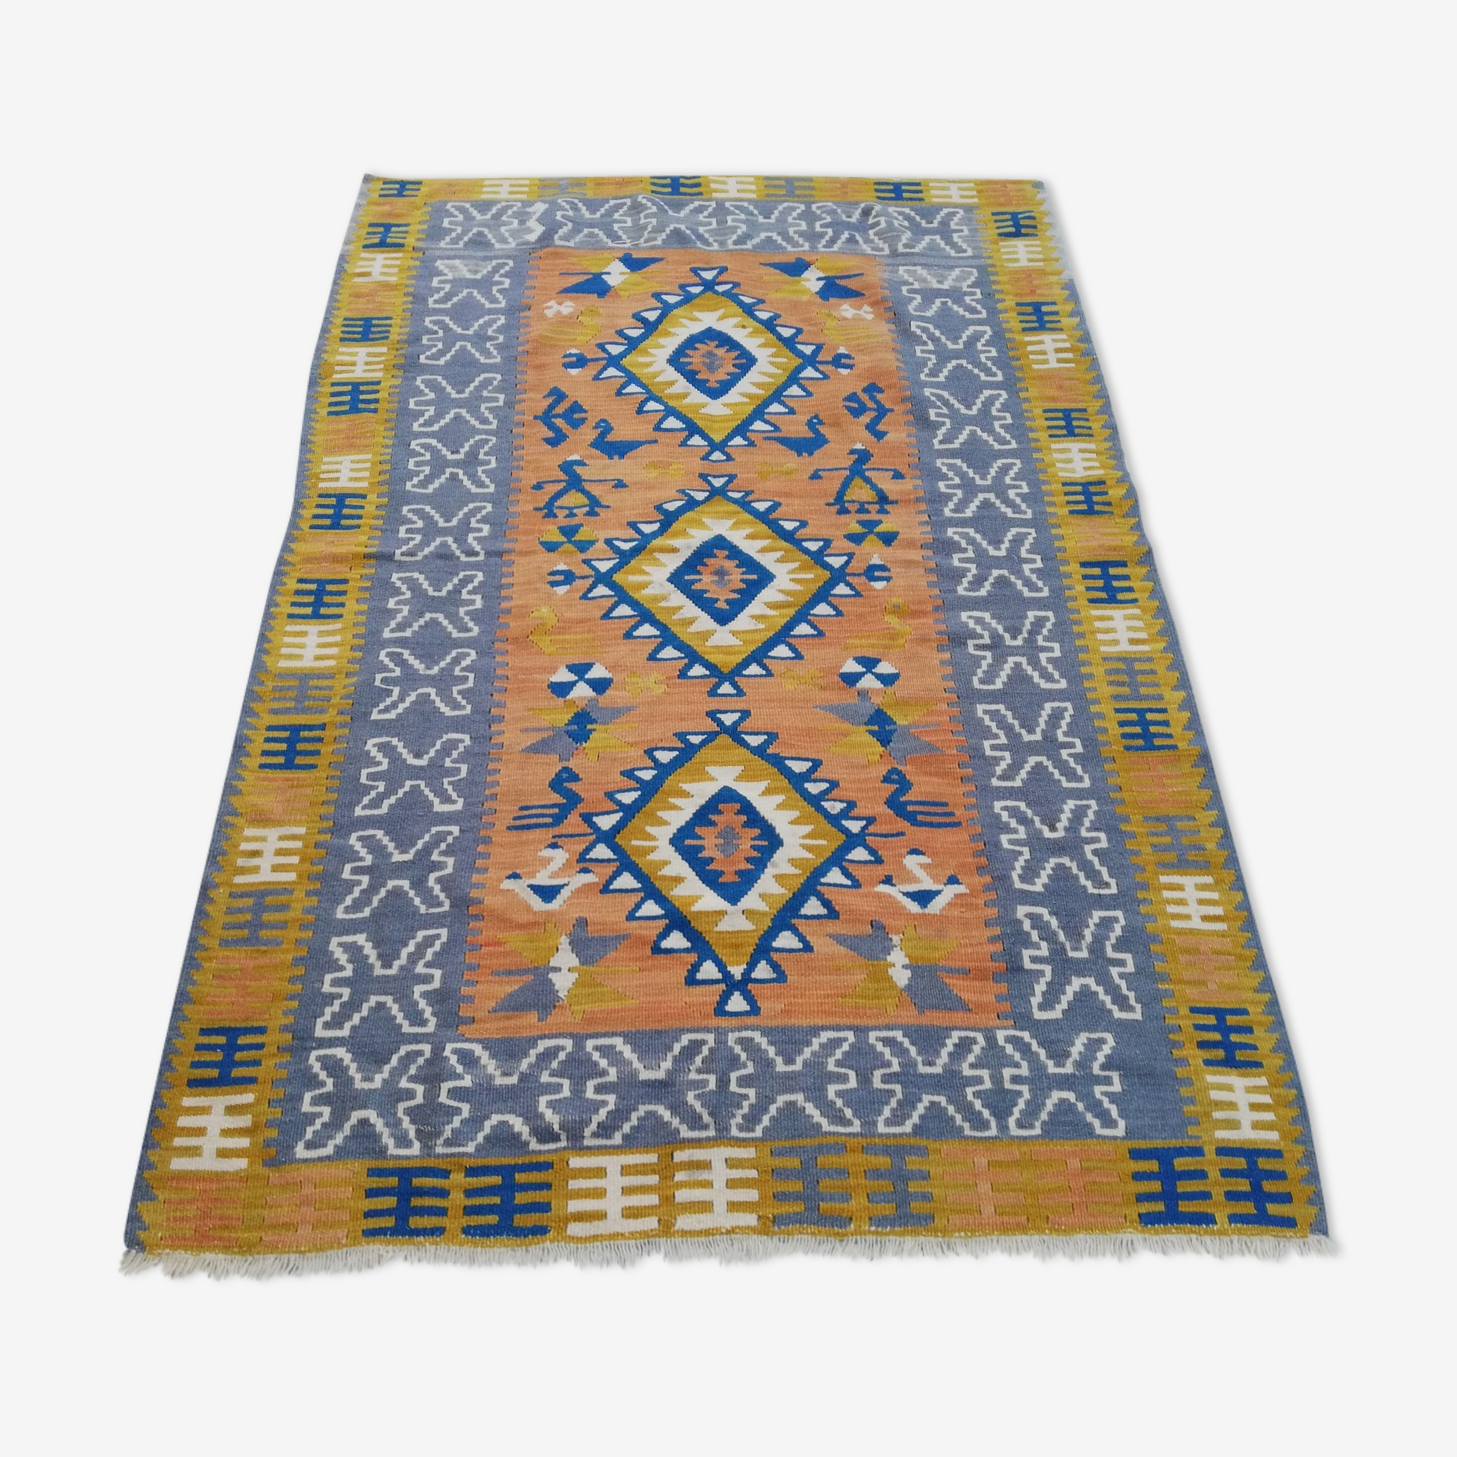 Tapis kilim berbère 155x105cm